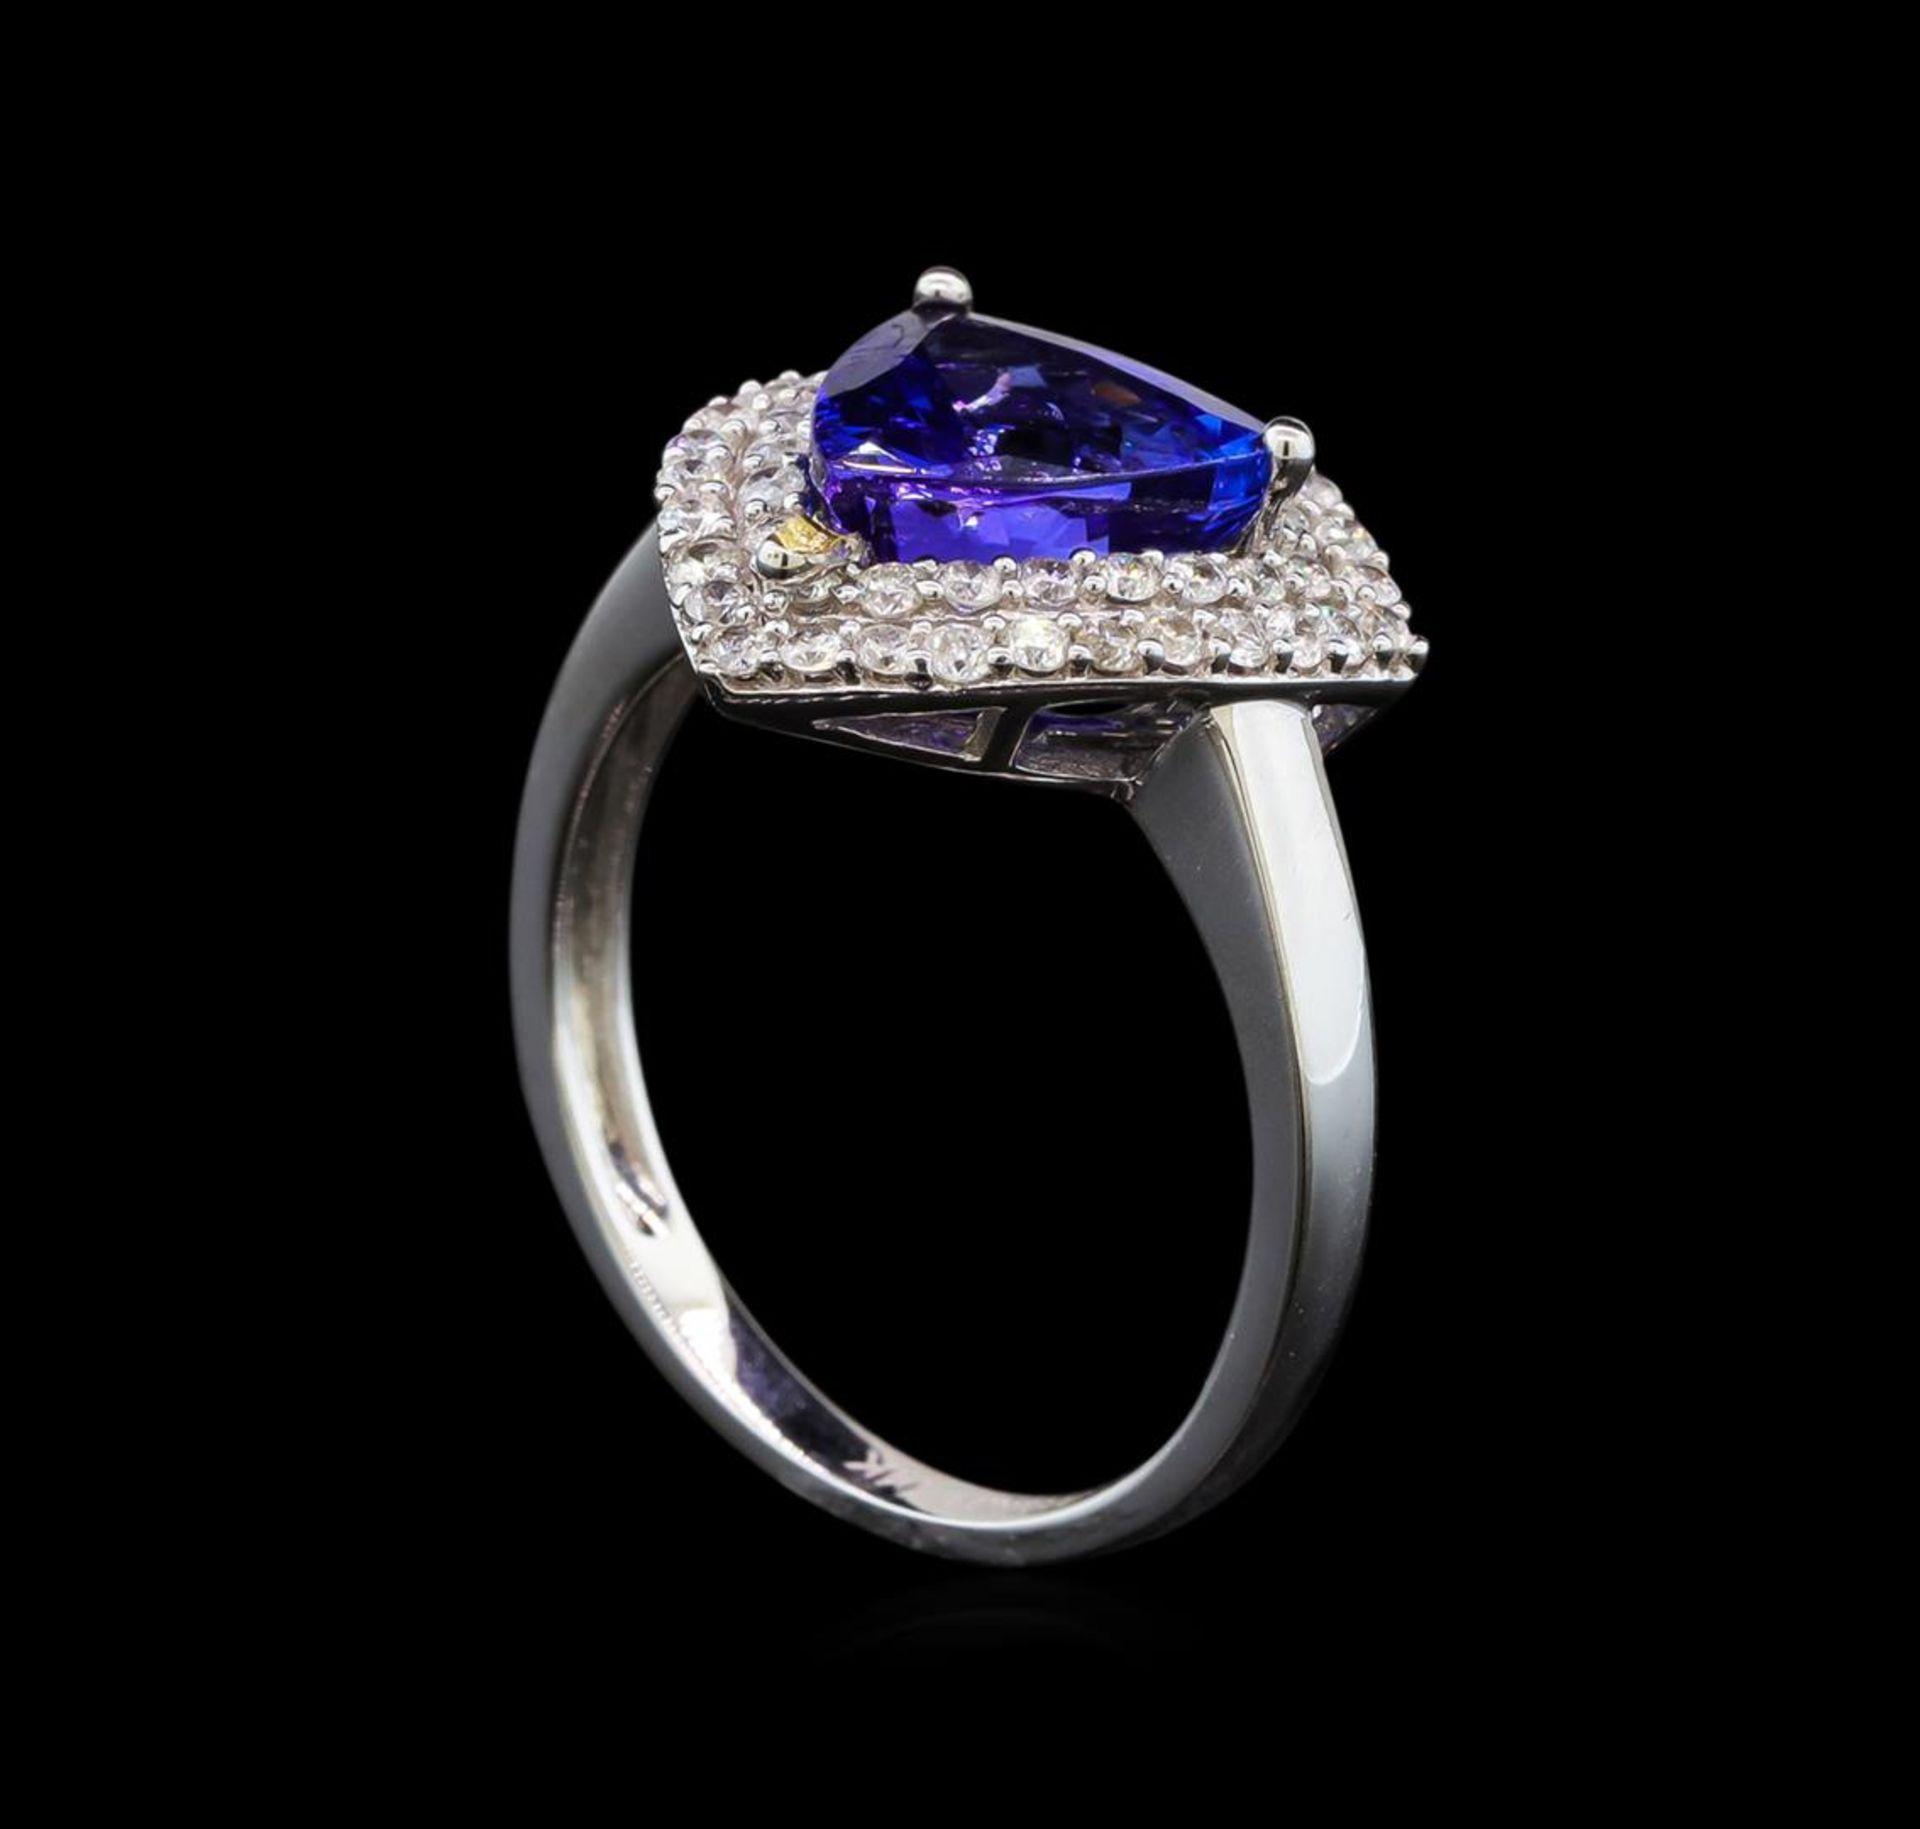 14KT White Gold 2.09 ctw Tanzanite and Diamond Ring - Image 4 of 5